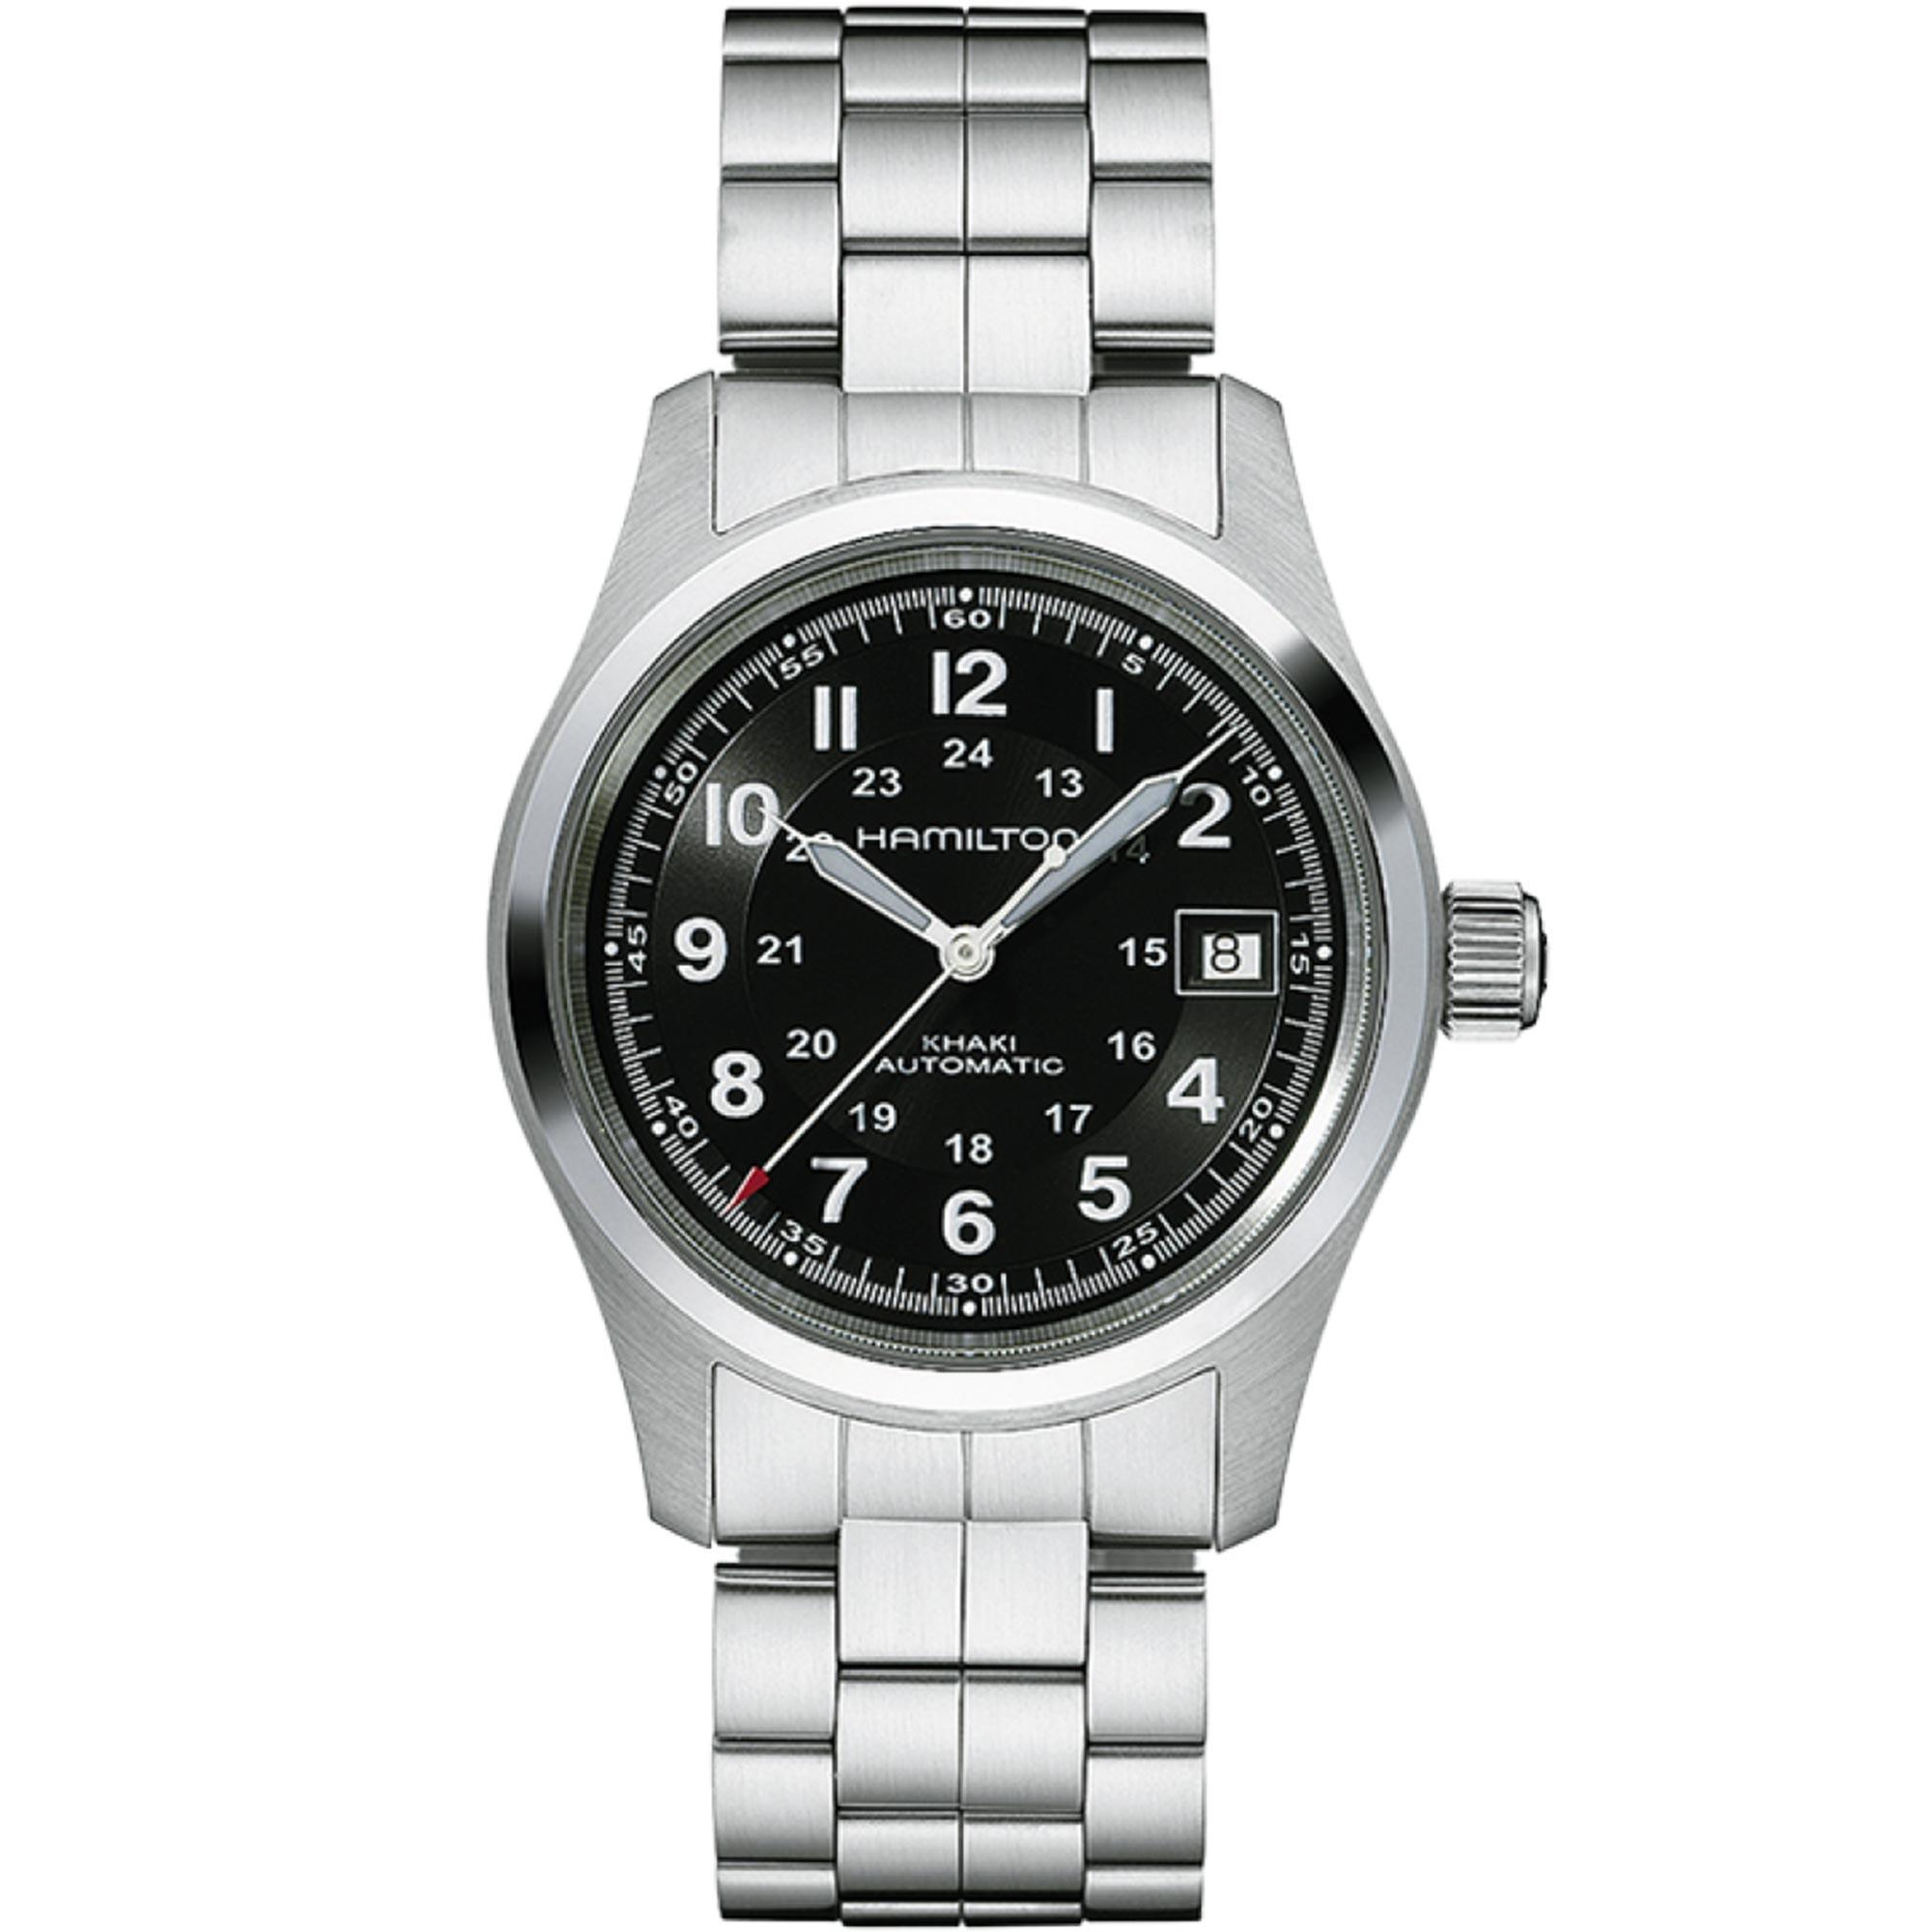 Hamilton Khaki Field Black Dial Stainless Steel Men's Watch